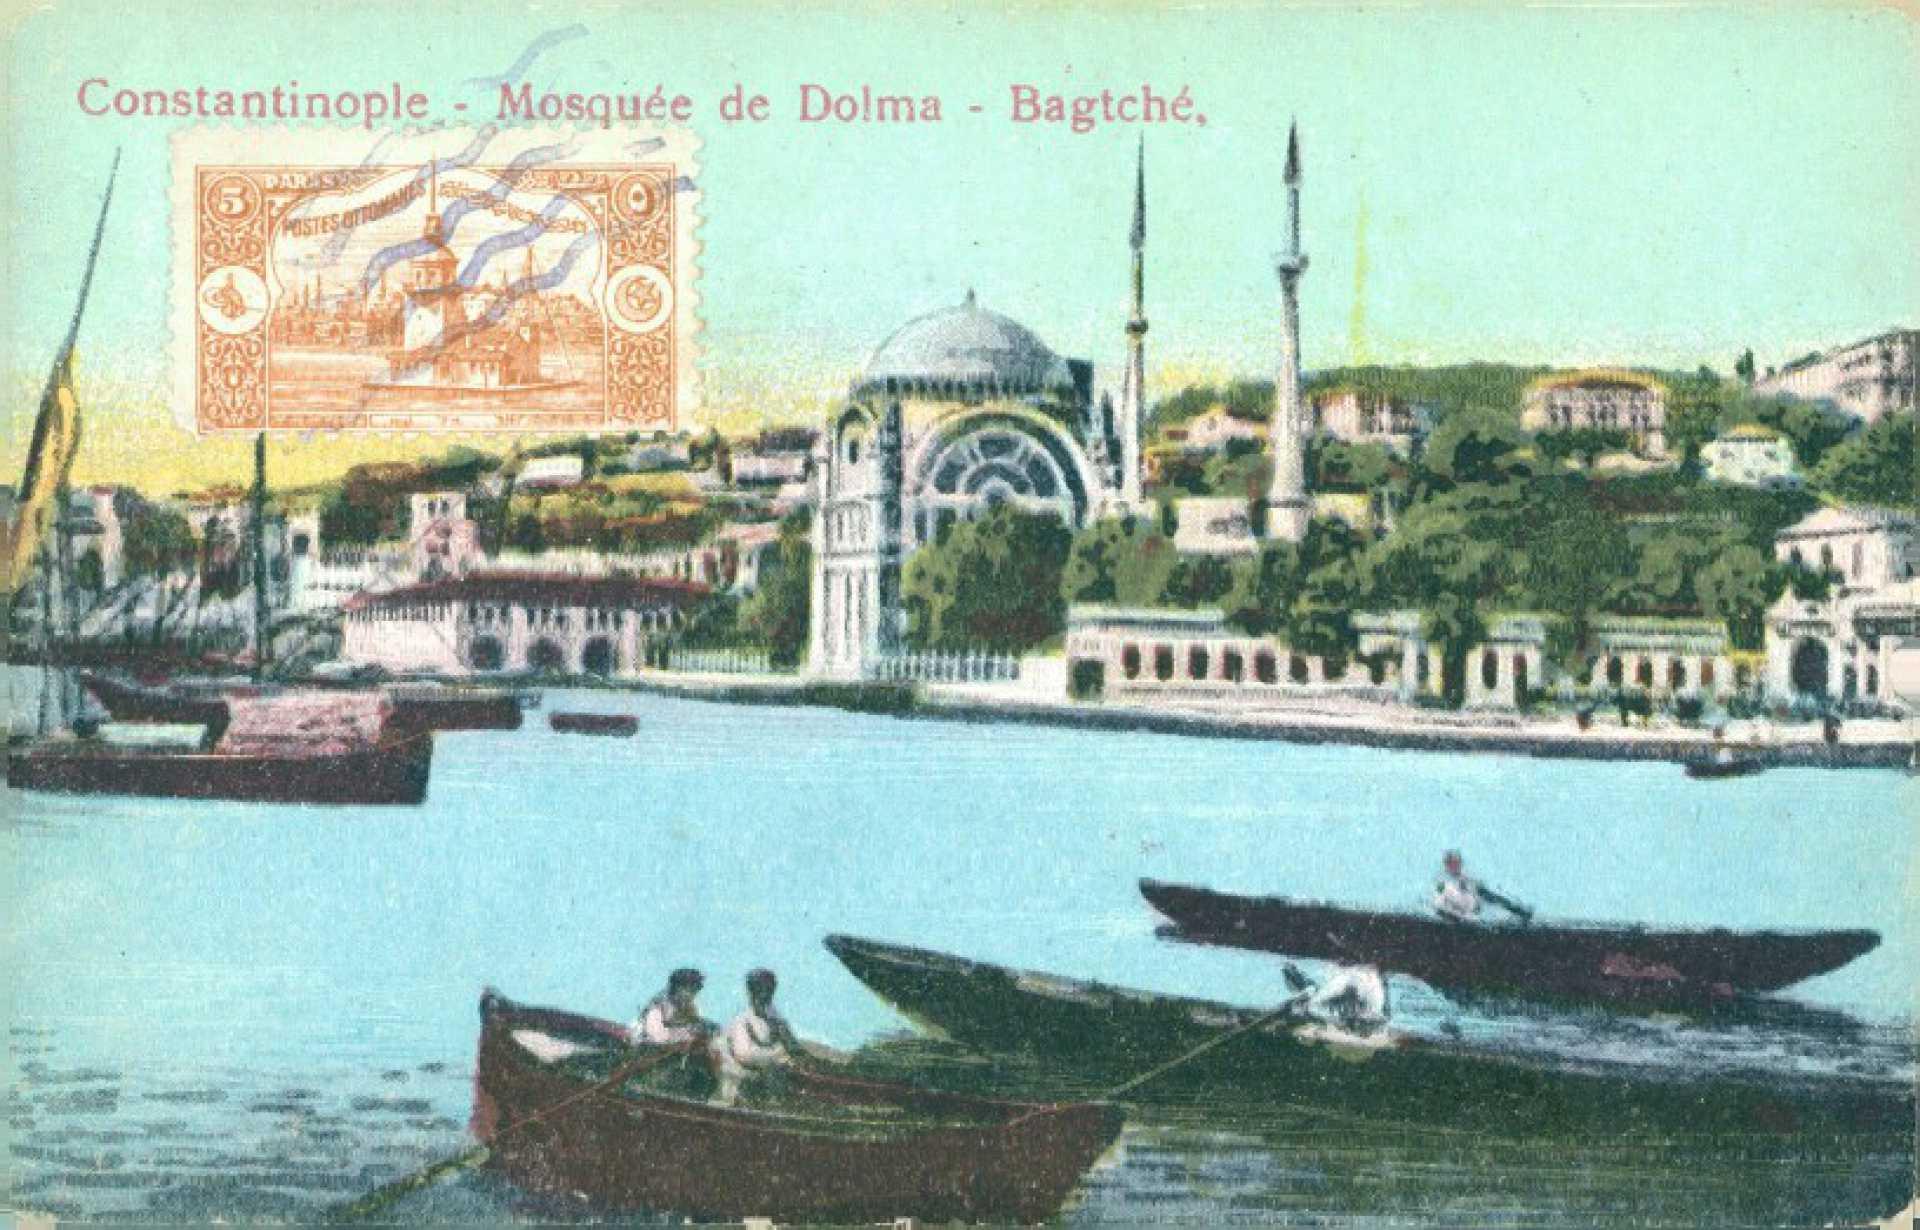 Mosquee de Dolma – Bagtche